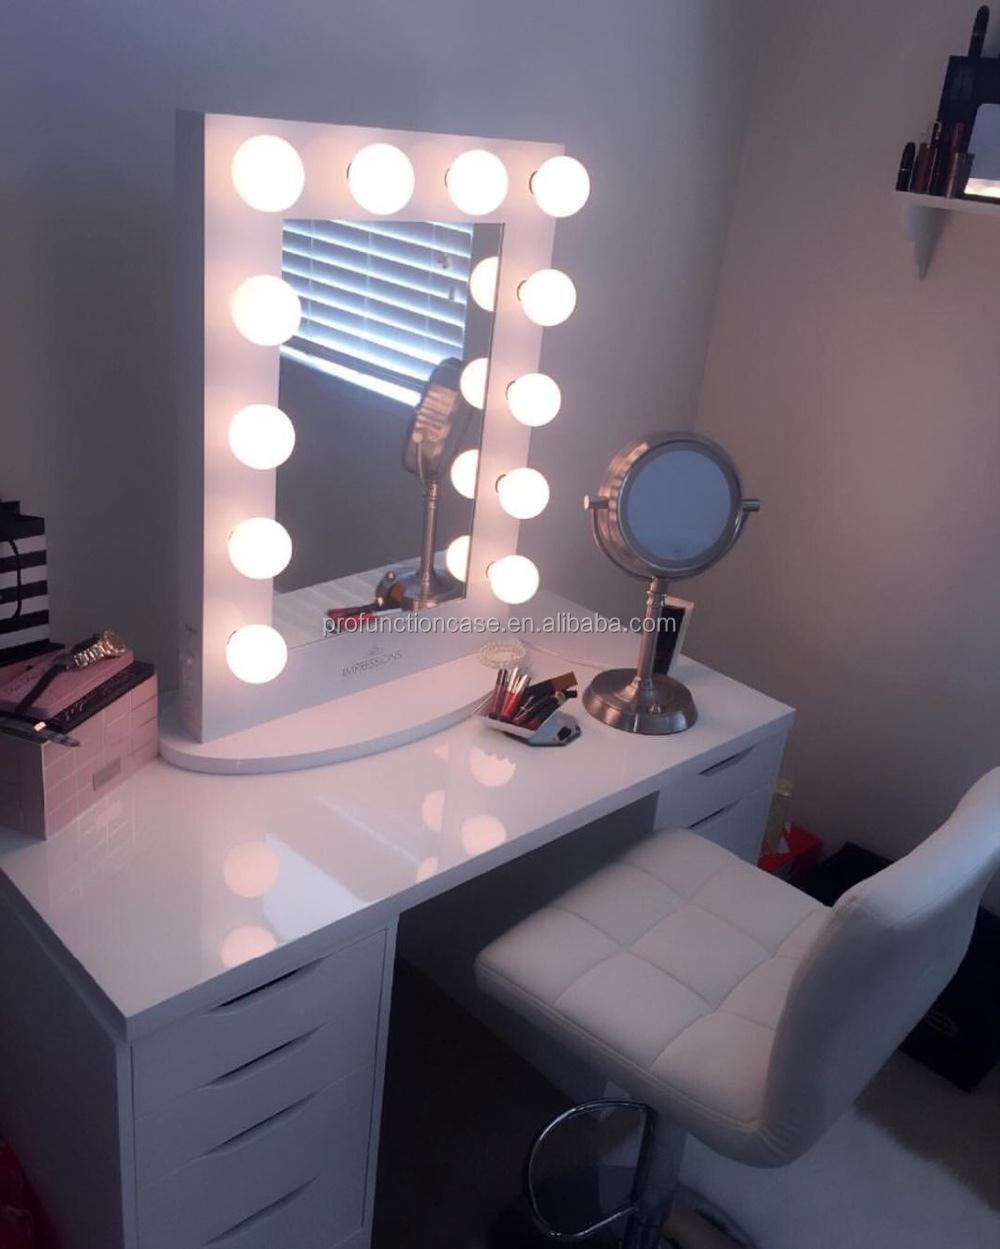 professionnel studio maquillage miroir avec led lumi res. Black Bedroom Furniture Sets. Home Design Ideas